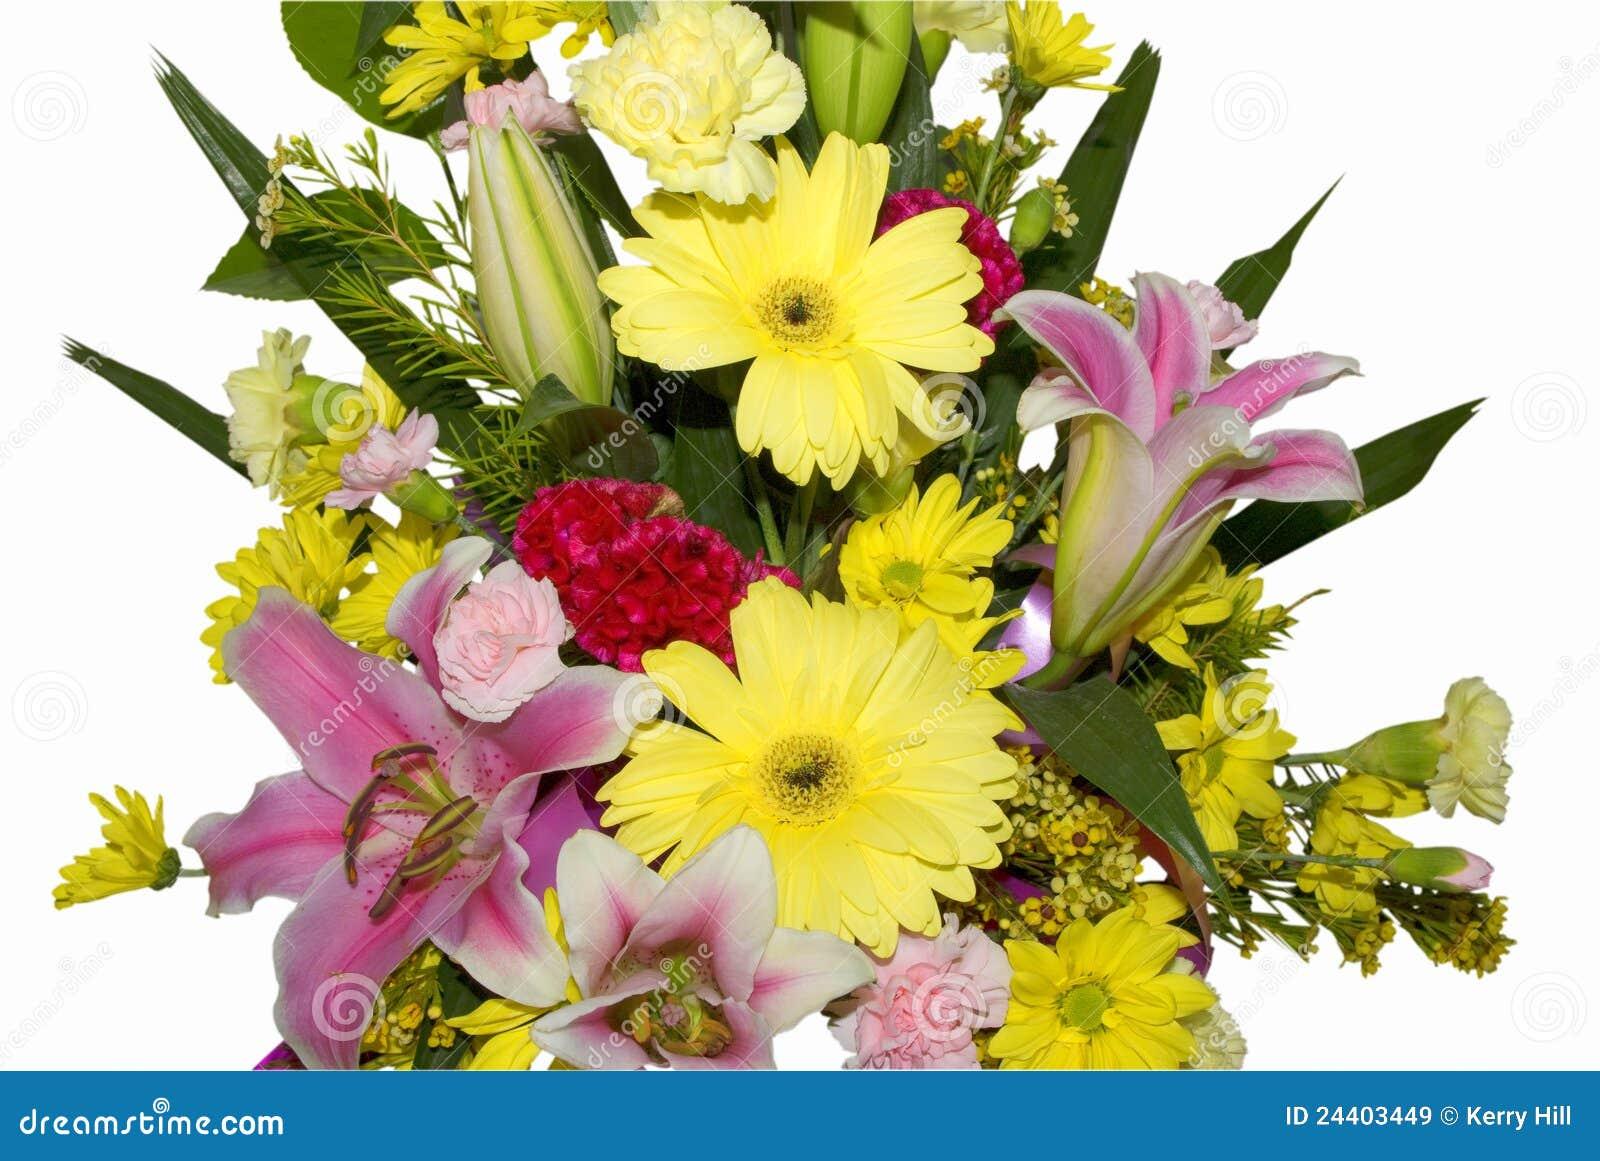 Ramos de hermosas flores imagui - Ramos de flores bonitos ...